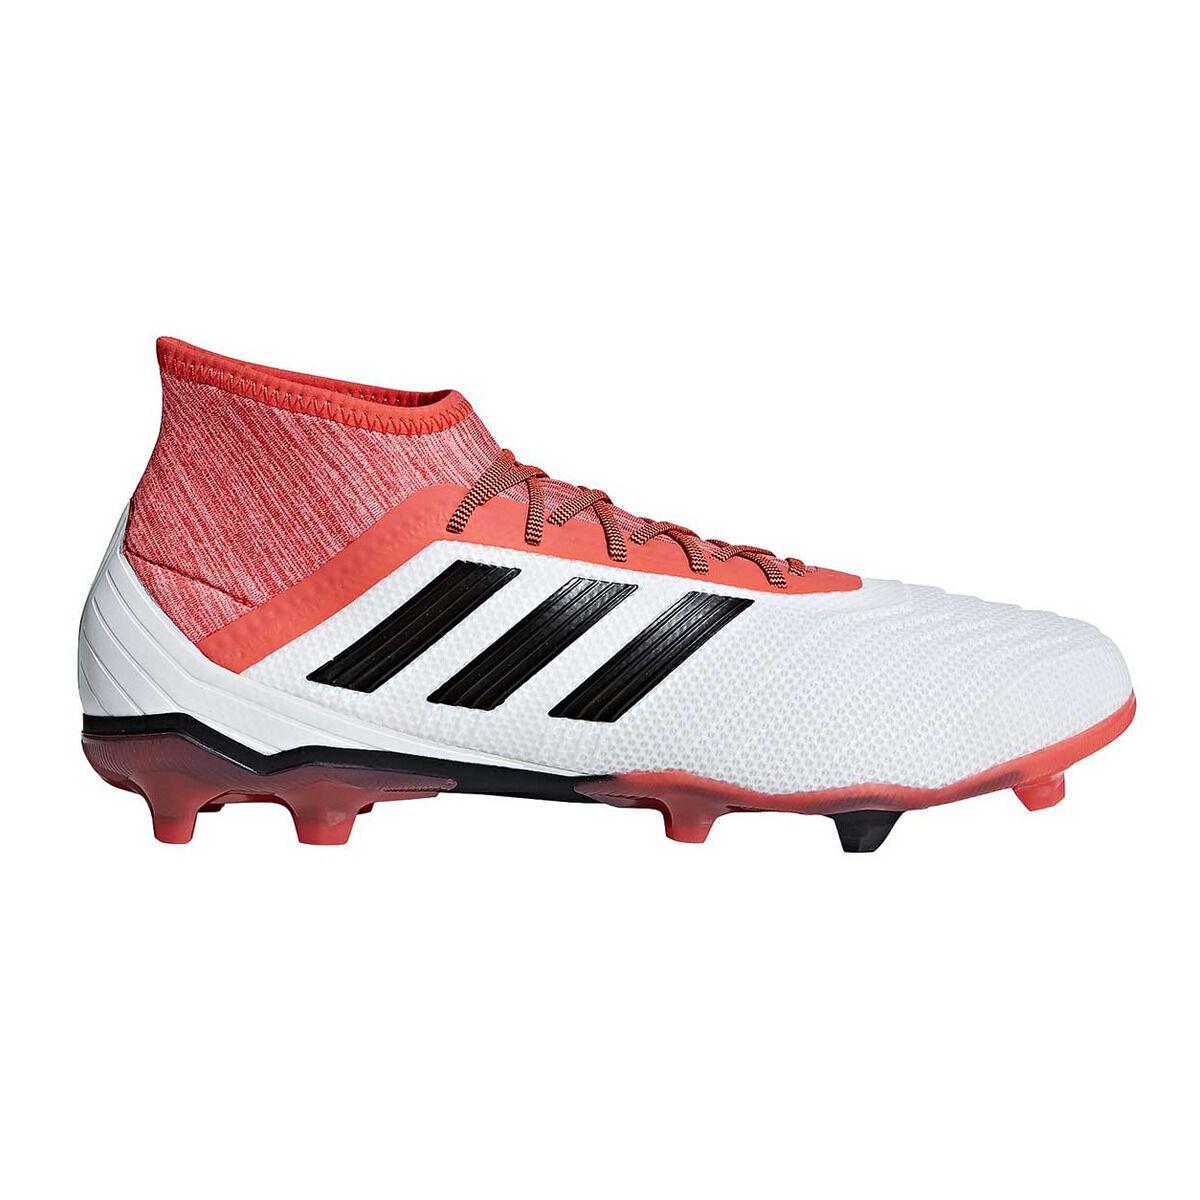 da1bae7e947 ... greece adidas predator 18.2 fg mens football boots white black us 11  adult white 06a25 2d352